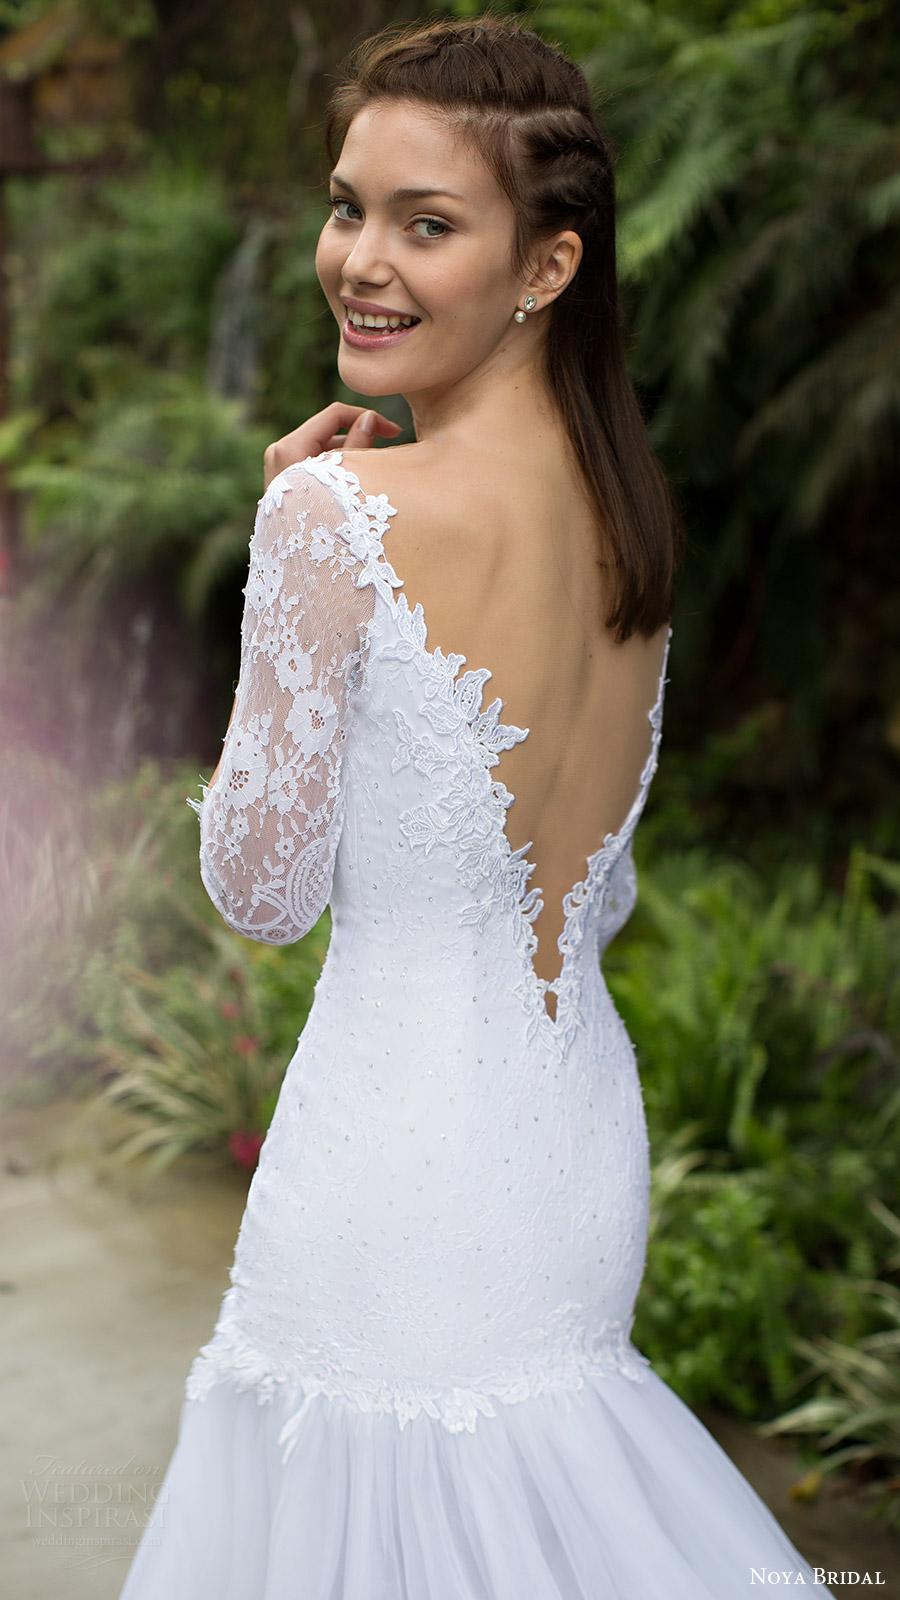 noya bridal 2016 3 quarter sleeves split sweetheart fit flare wedding dress (1205) bv lowback elegant